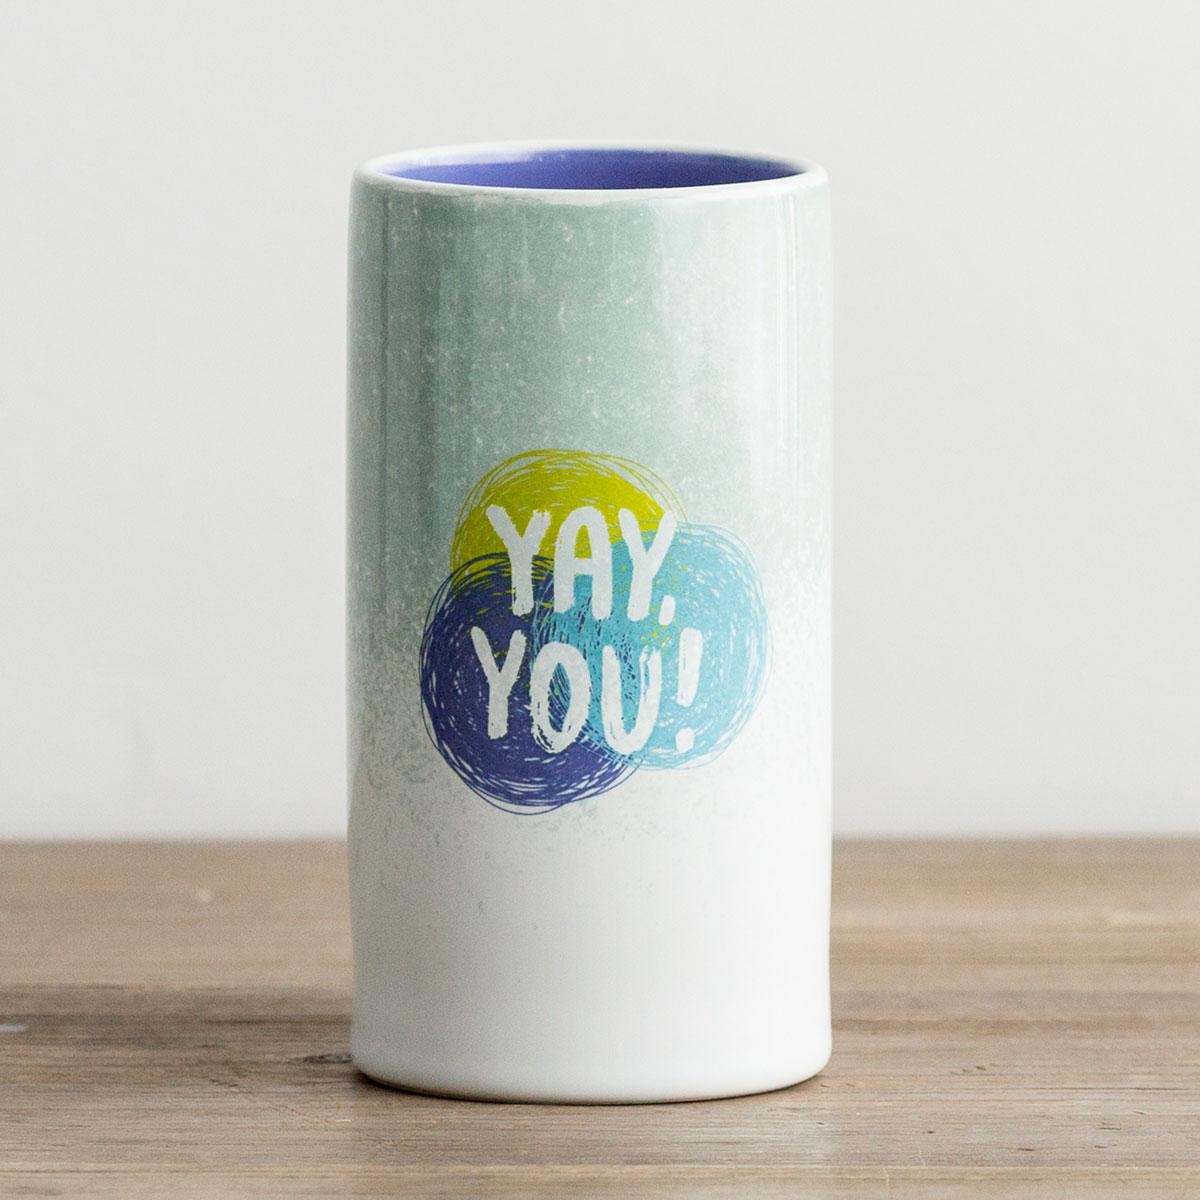 Yay, You! - Ceramic Pencil Holder